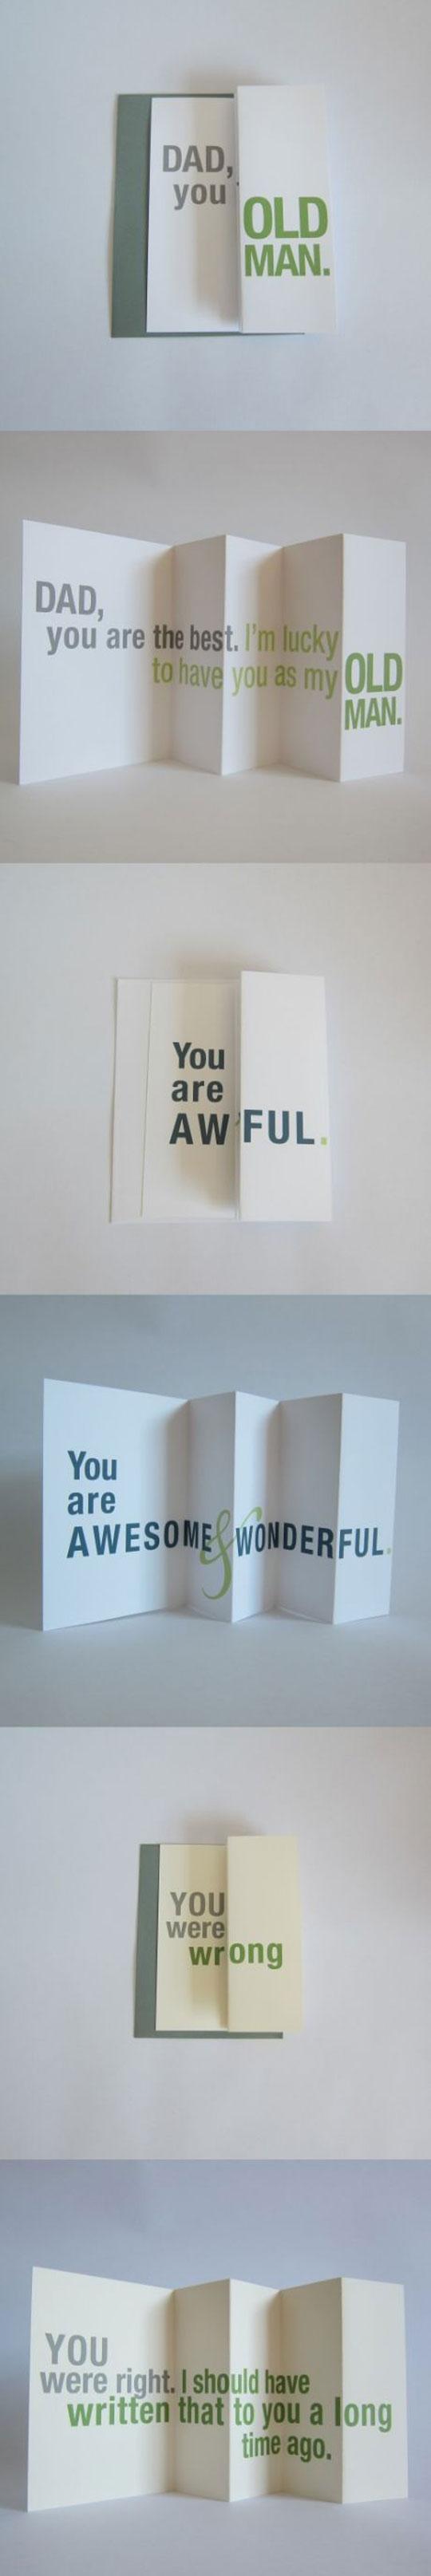 funny-heartwarming-message-card-deceiving